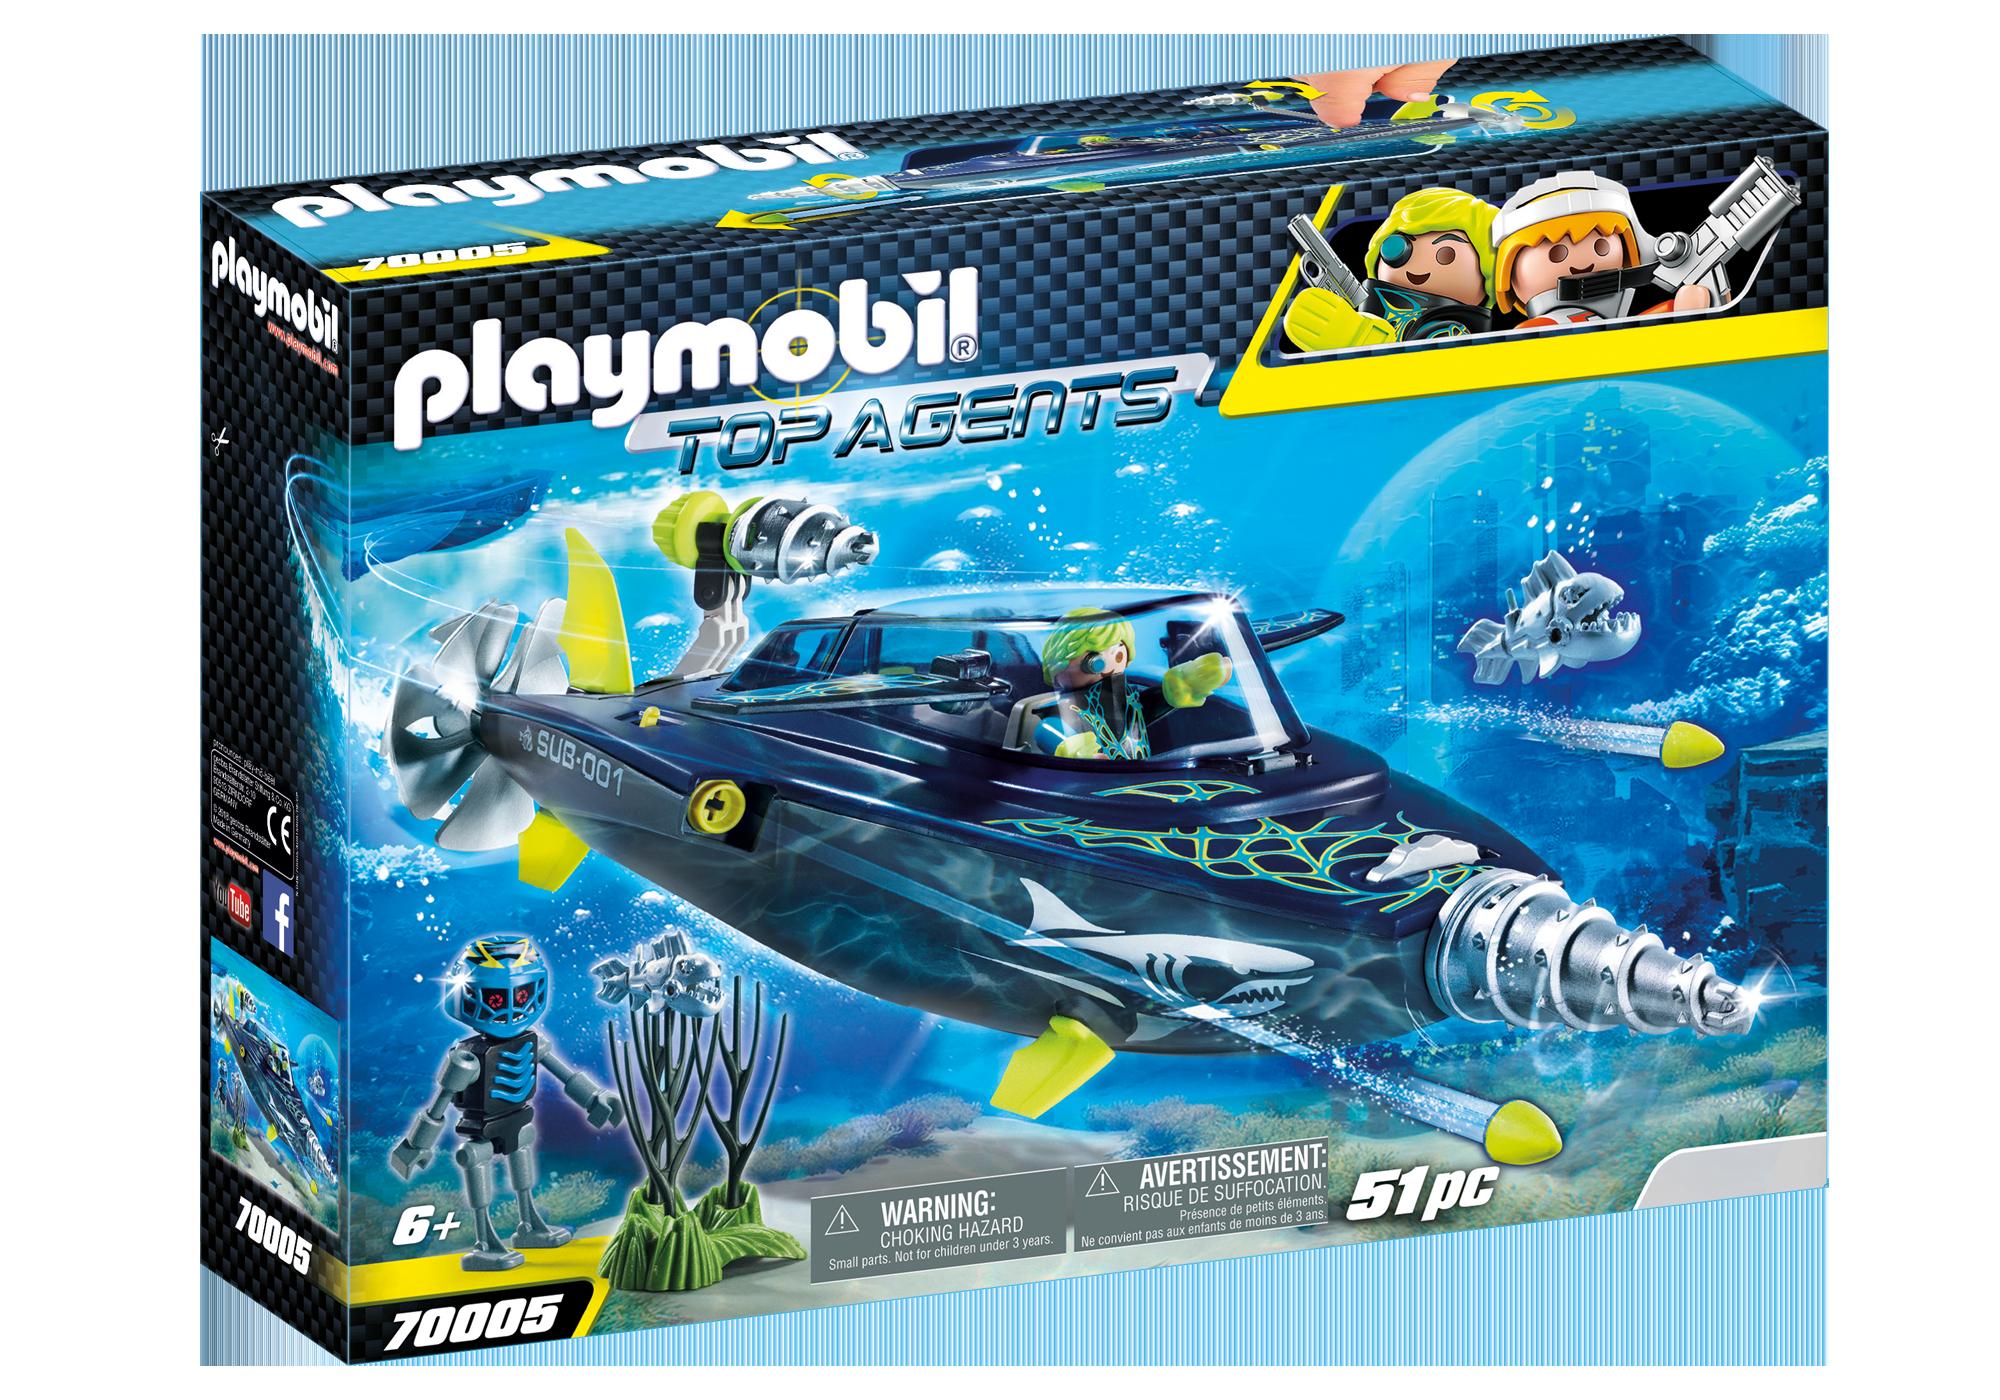 http://media.playmobil.com/i/playmobil/70005_product_box_front